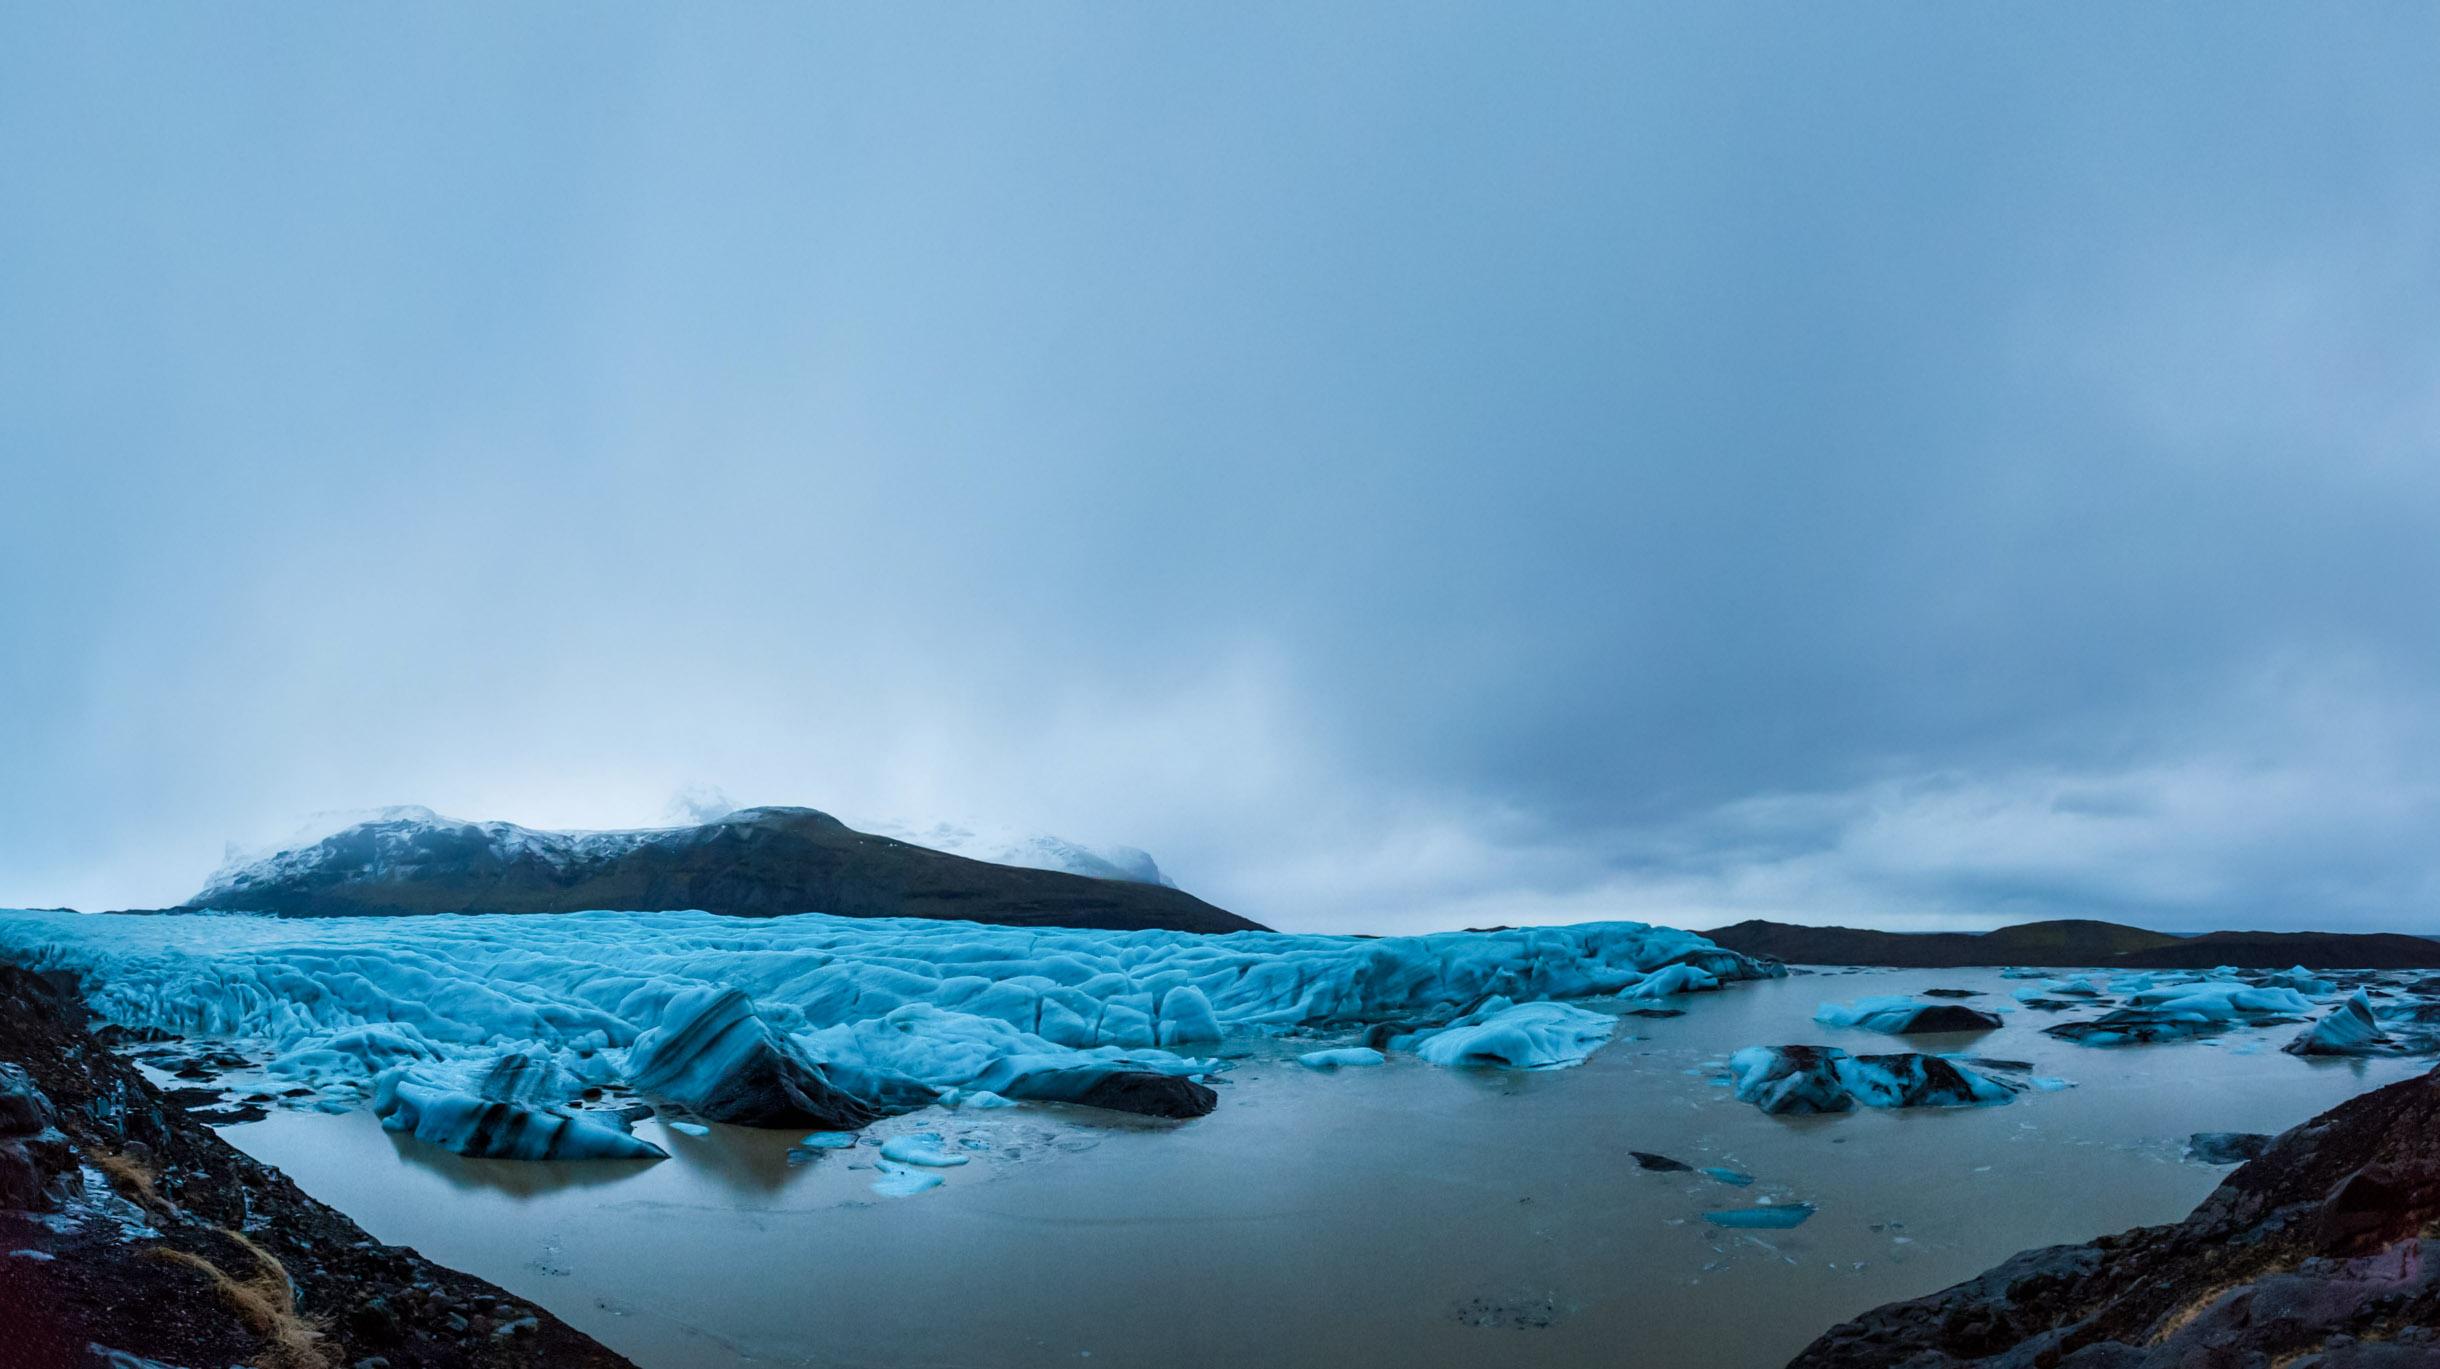 Iceland Glacier Lagoon Picture In Winter